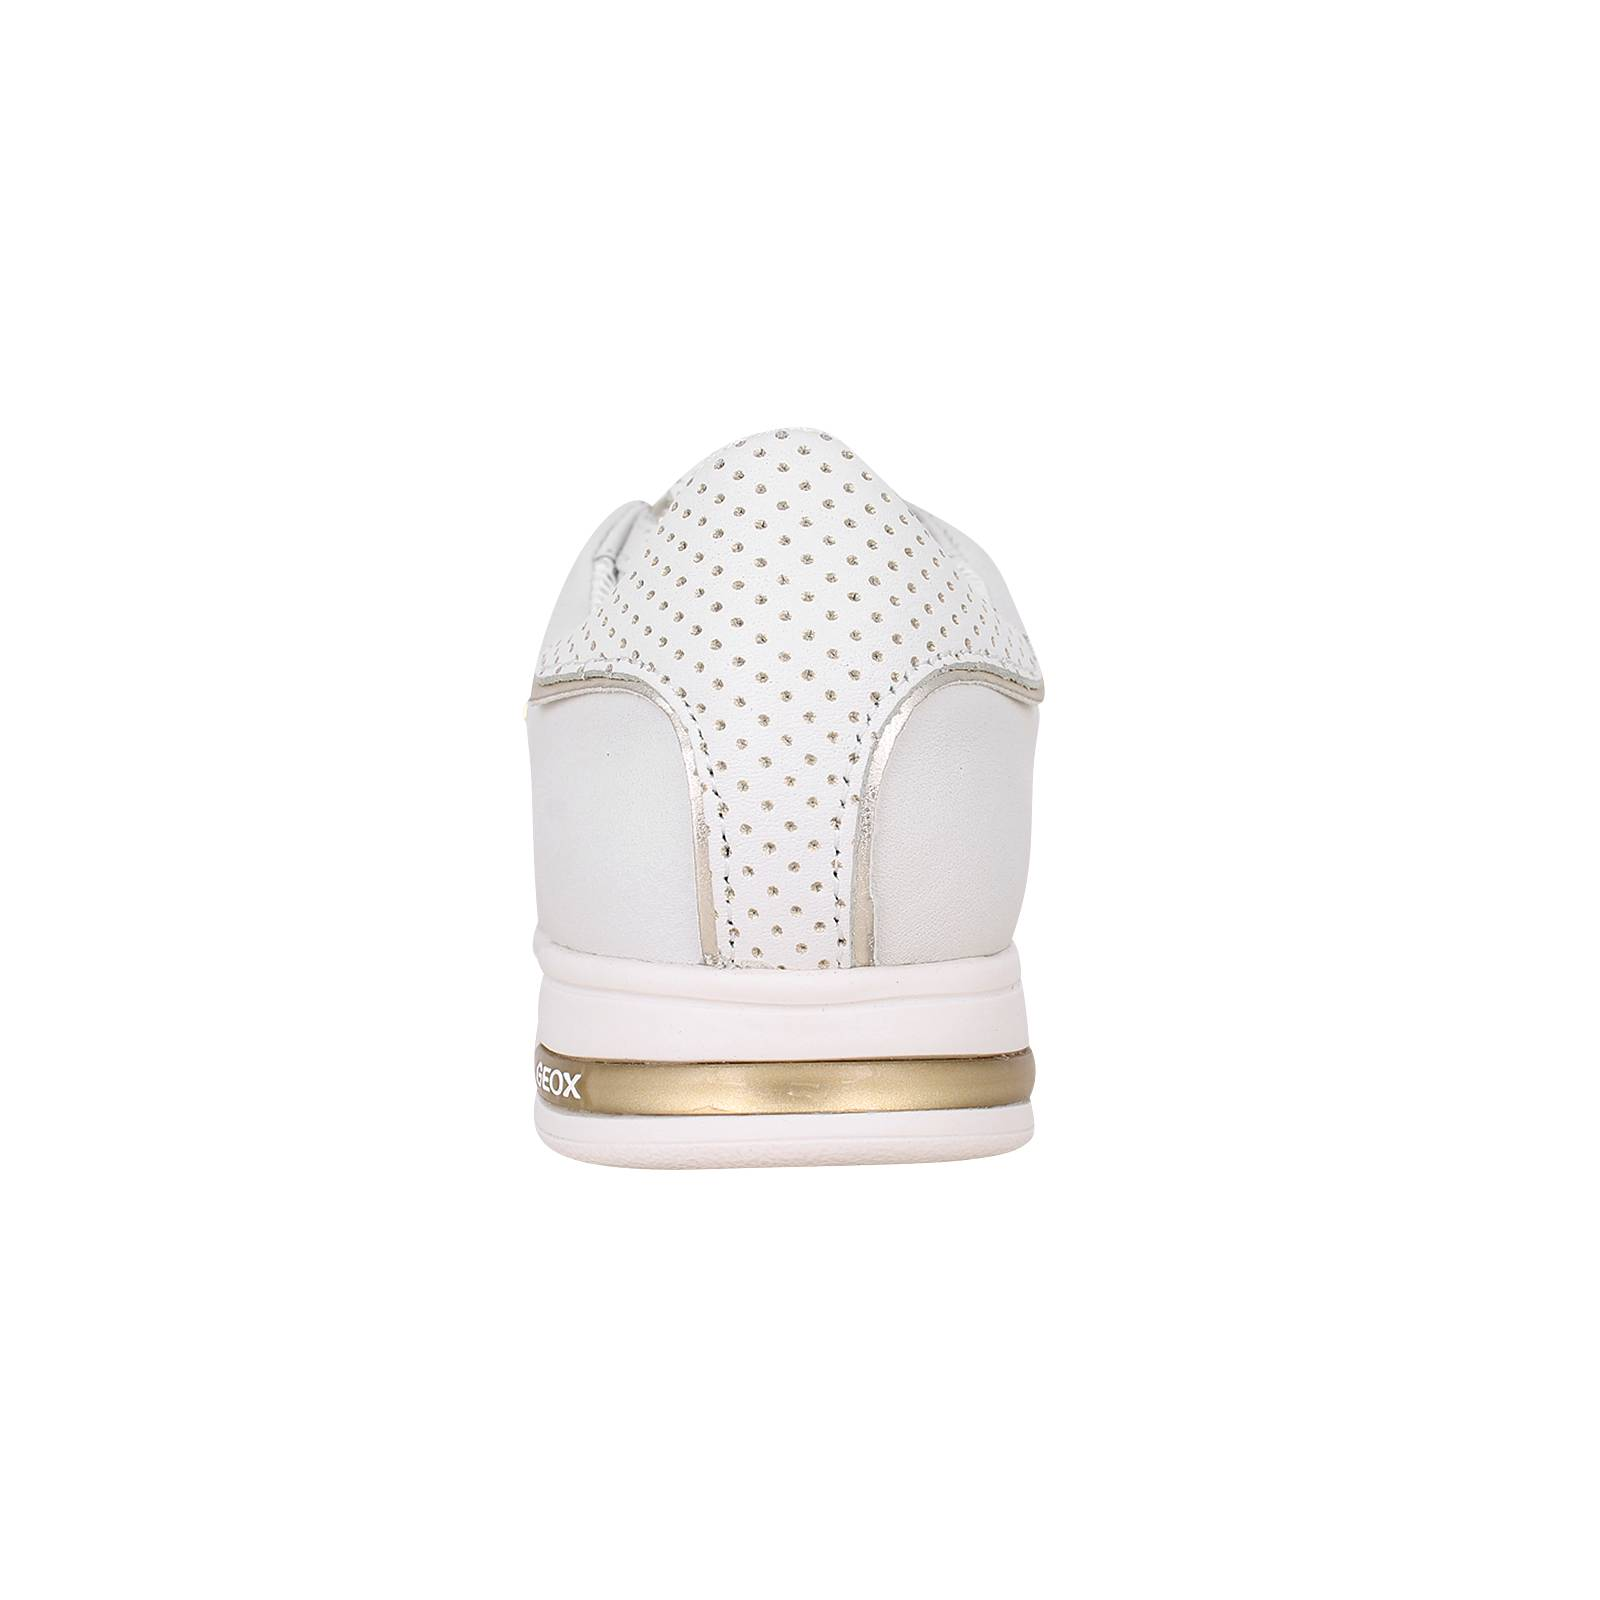 Codeso - Γυναικεία παπούτσια casual Geox από δέρμα - Gianna Kazakou ... 84cc8d47d9b